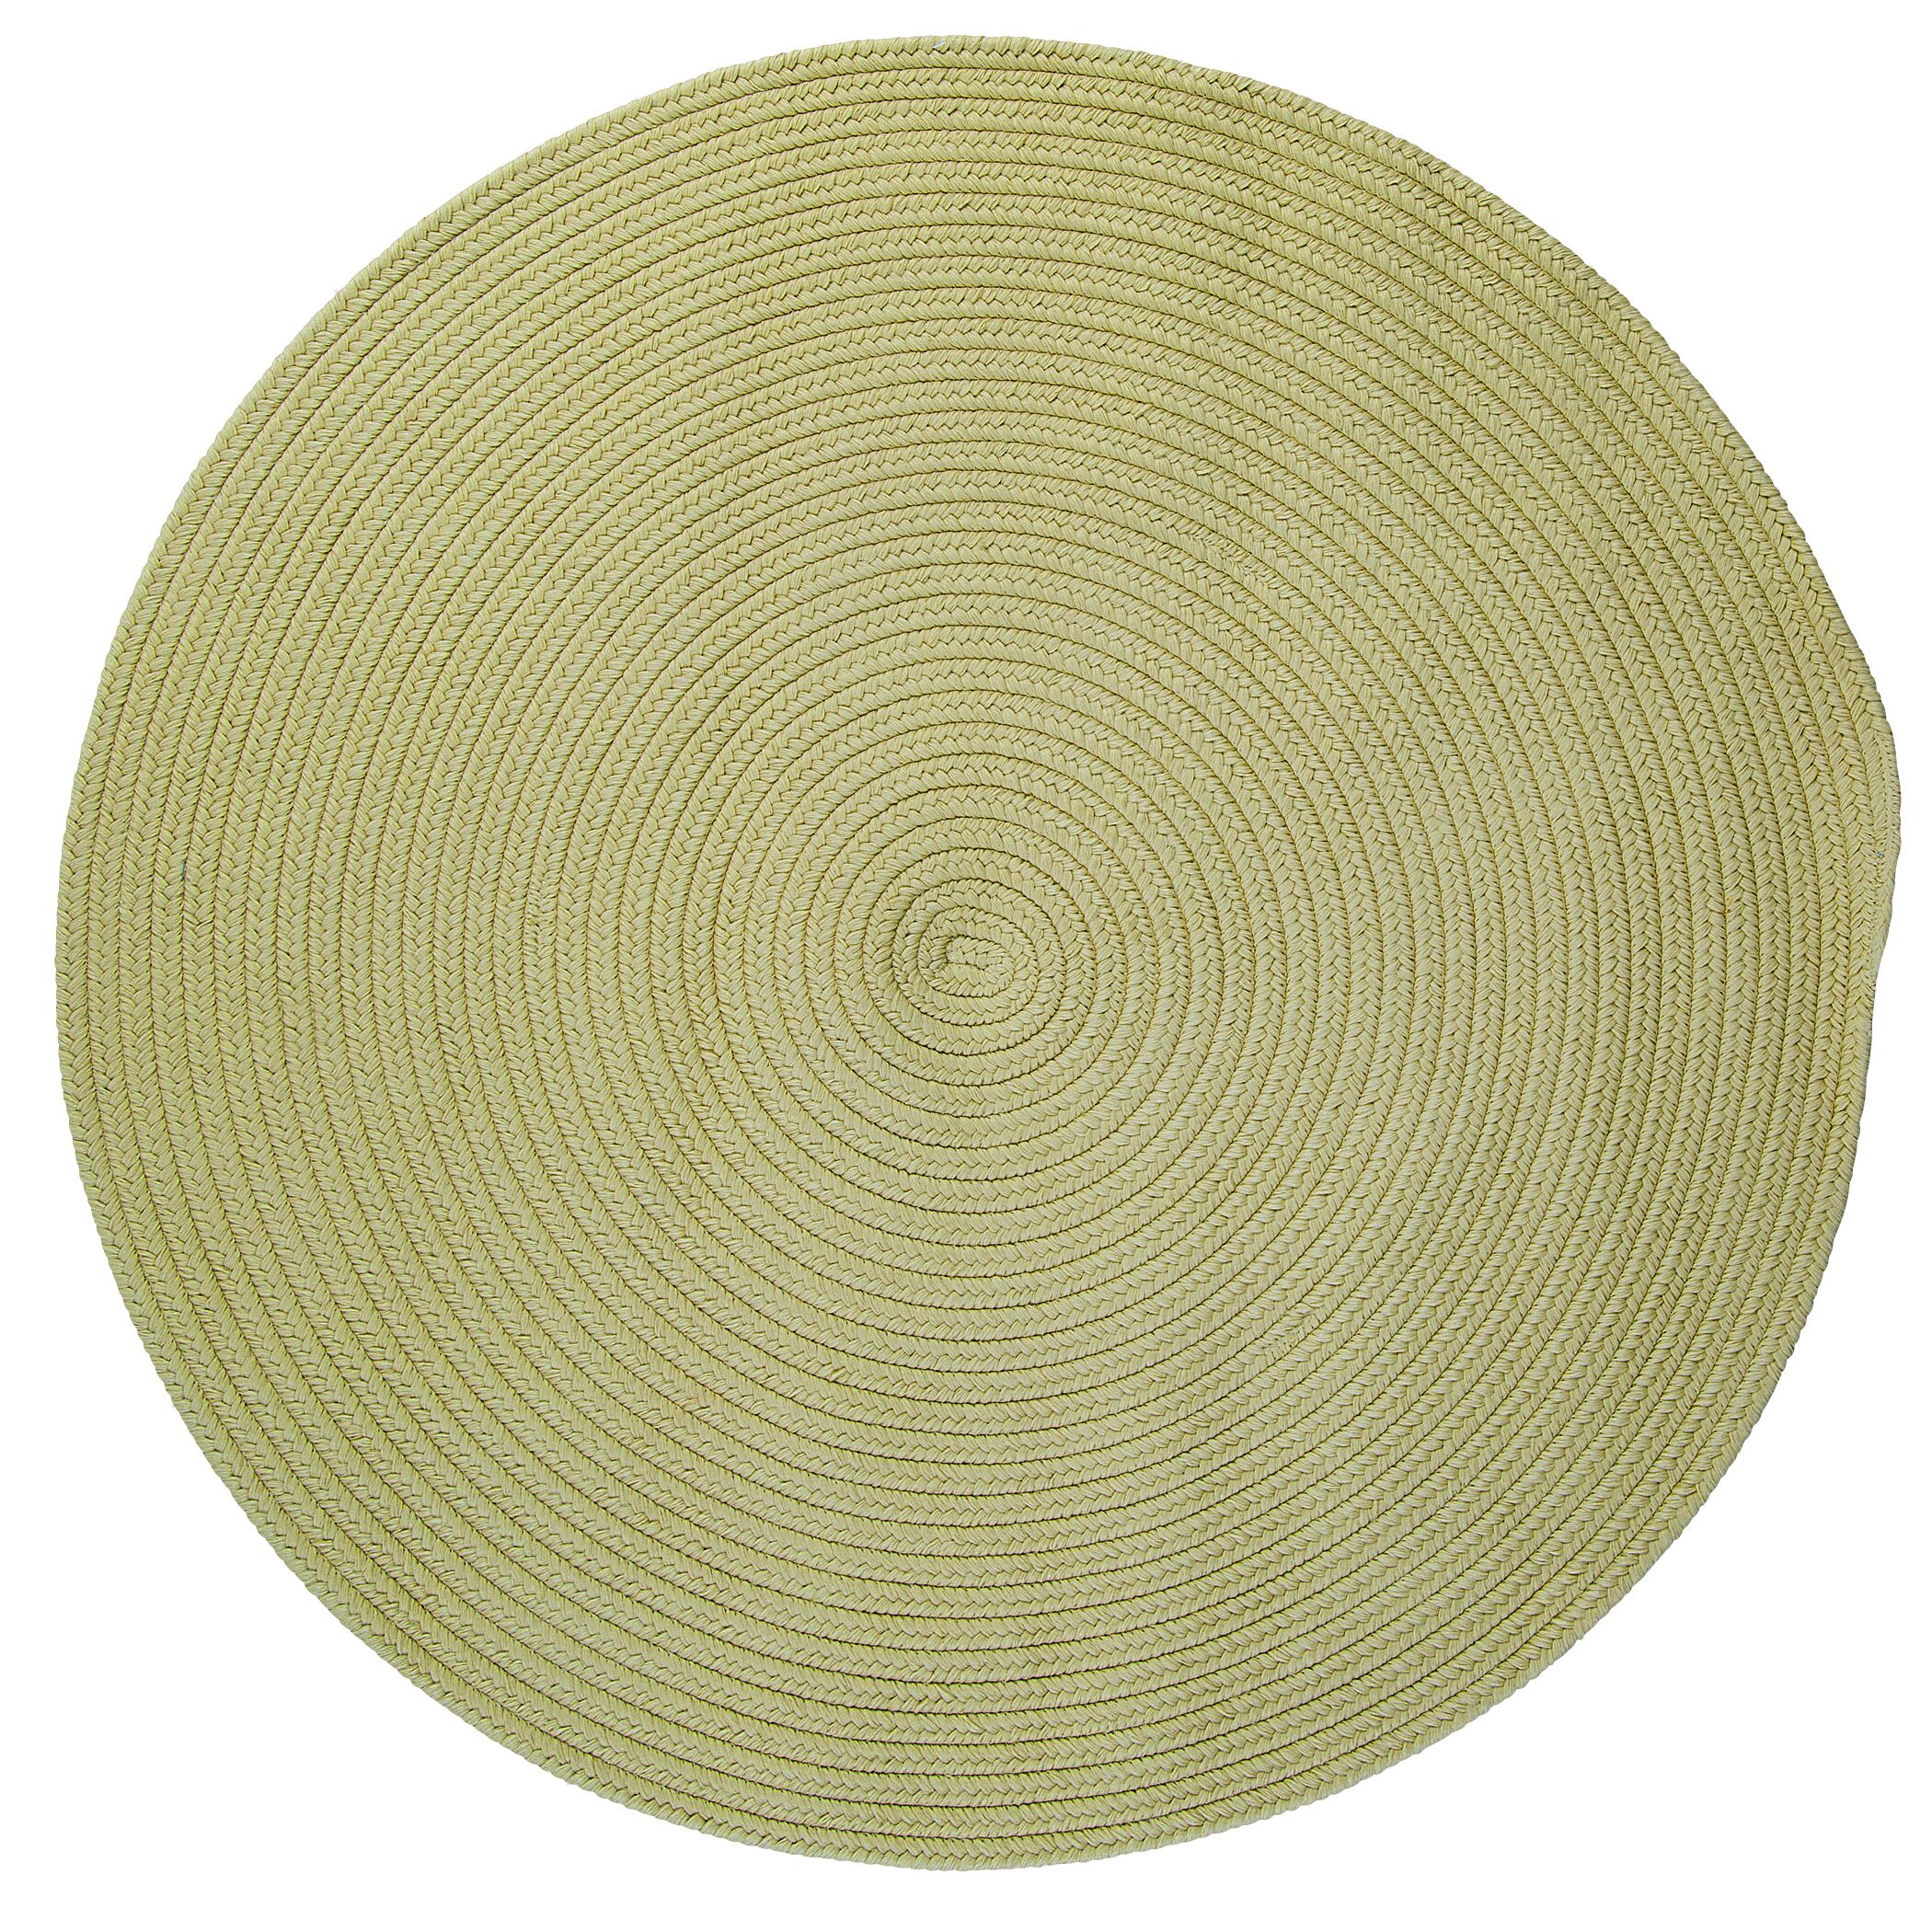 Mcintyre Celery Outdoor Area Rug Rug Size: Round 6'